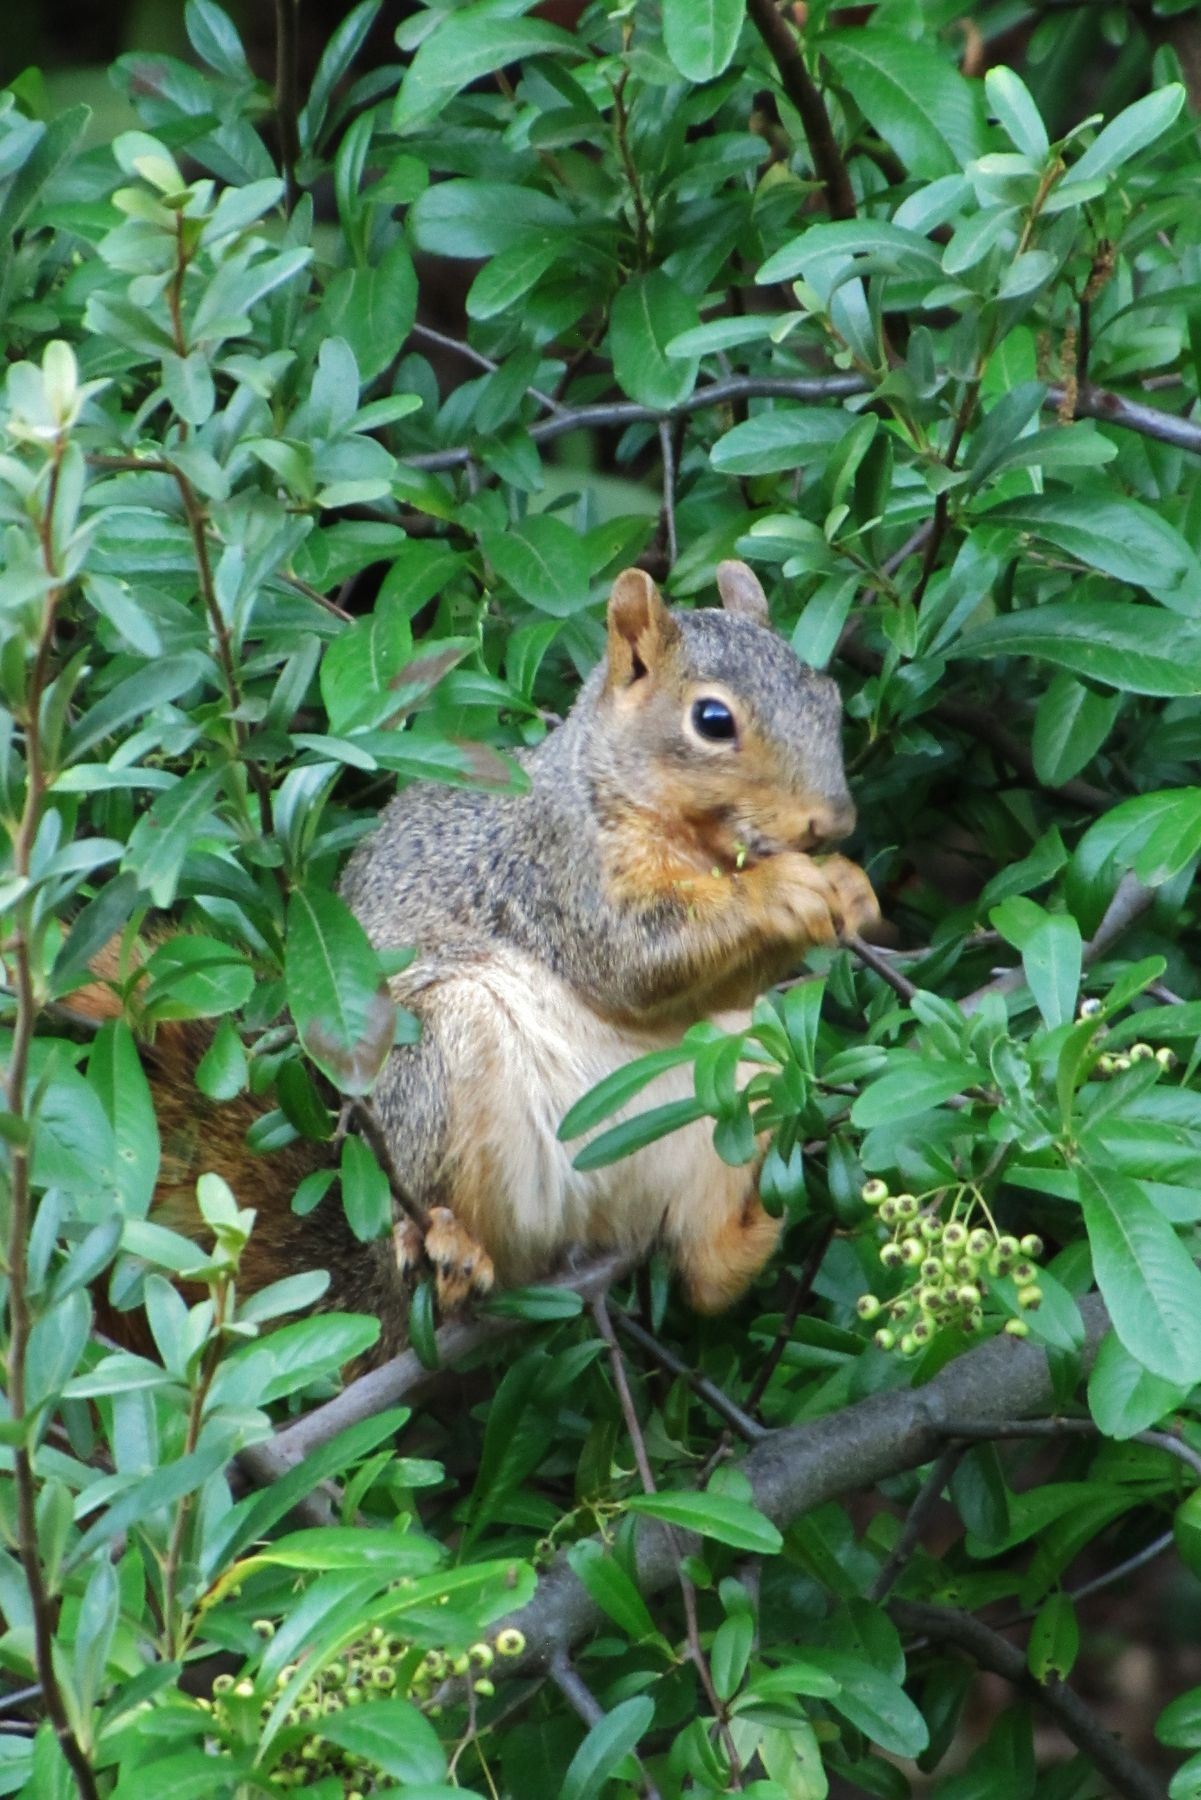 Красная белка красная белка животное грызун american red squirrel tamiasciurus hudsonicus animal